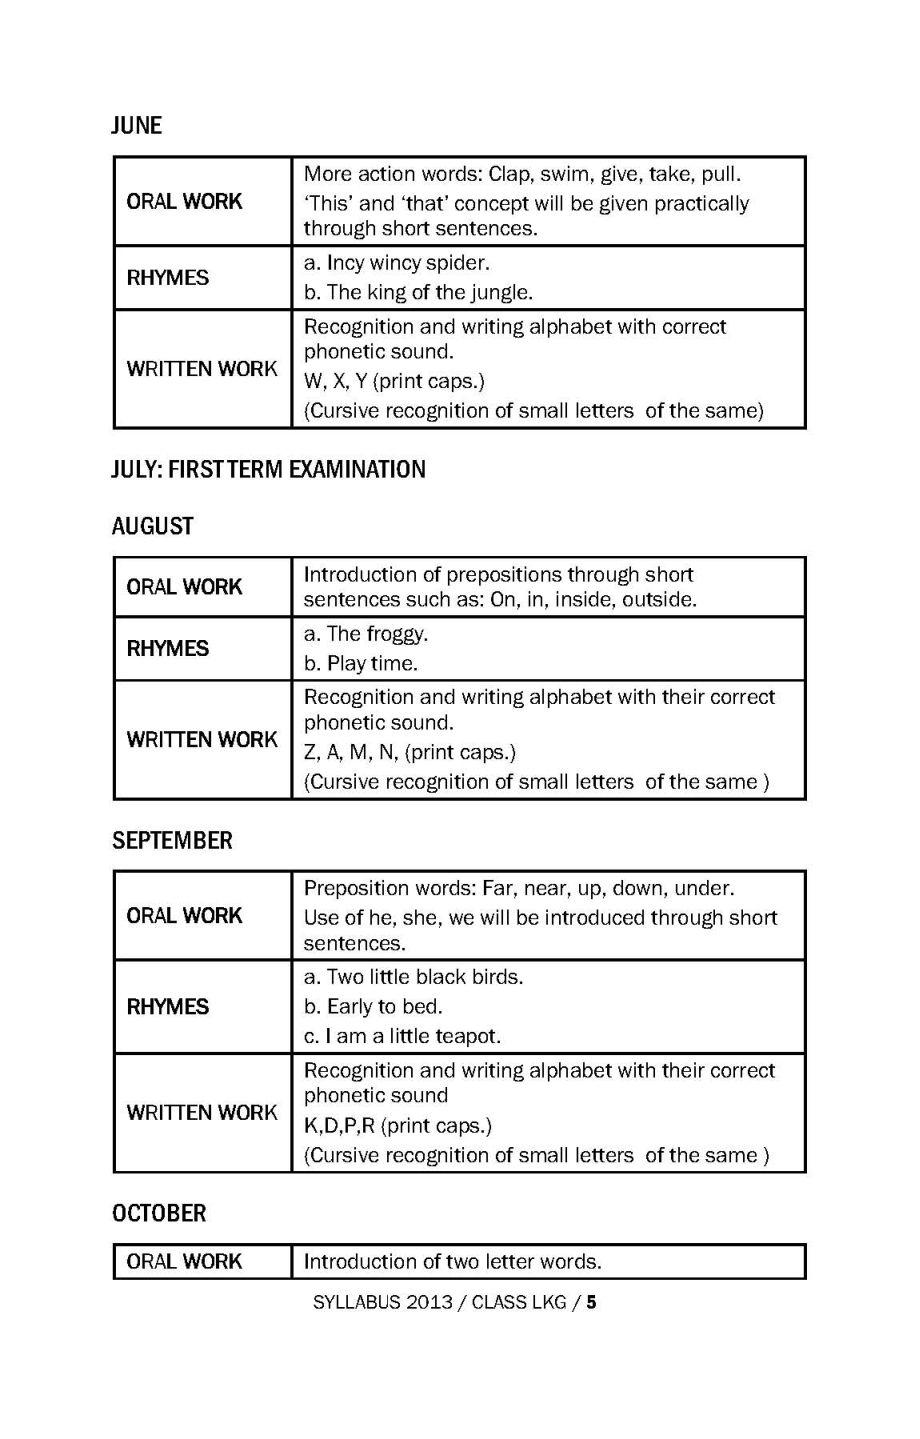 Workbooks hindi worksheets for ukg students : 100+ [ Hindi Worksheets For Class Ukg ] | Evs Worksheets For Class ...